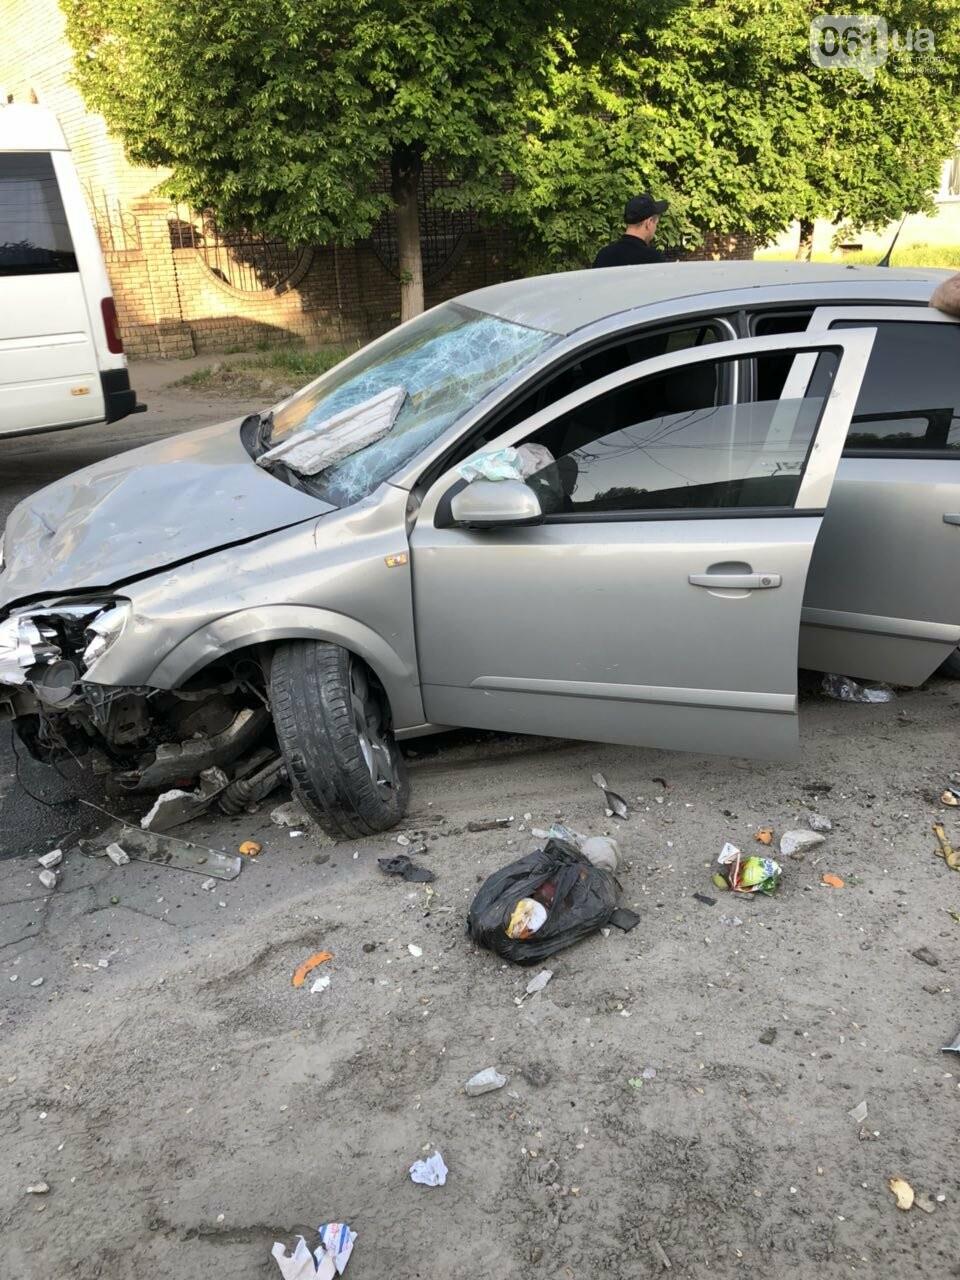 Запорожец разбил автомобиль, въехав в мусорный бак, - ФОТО, фото-2